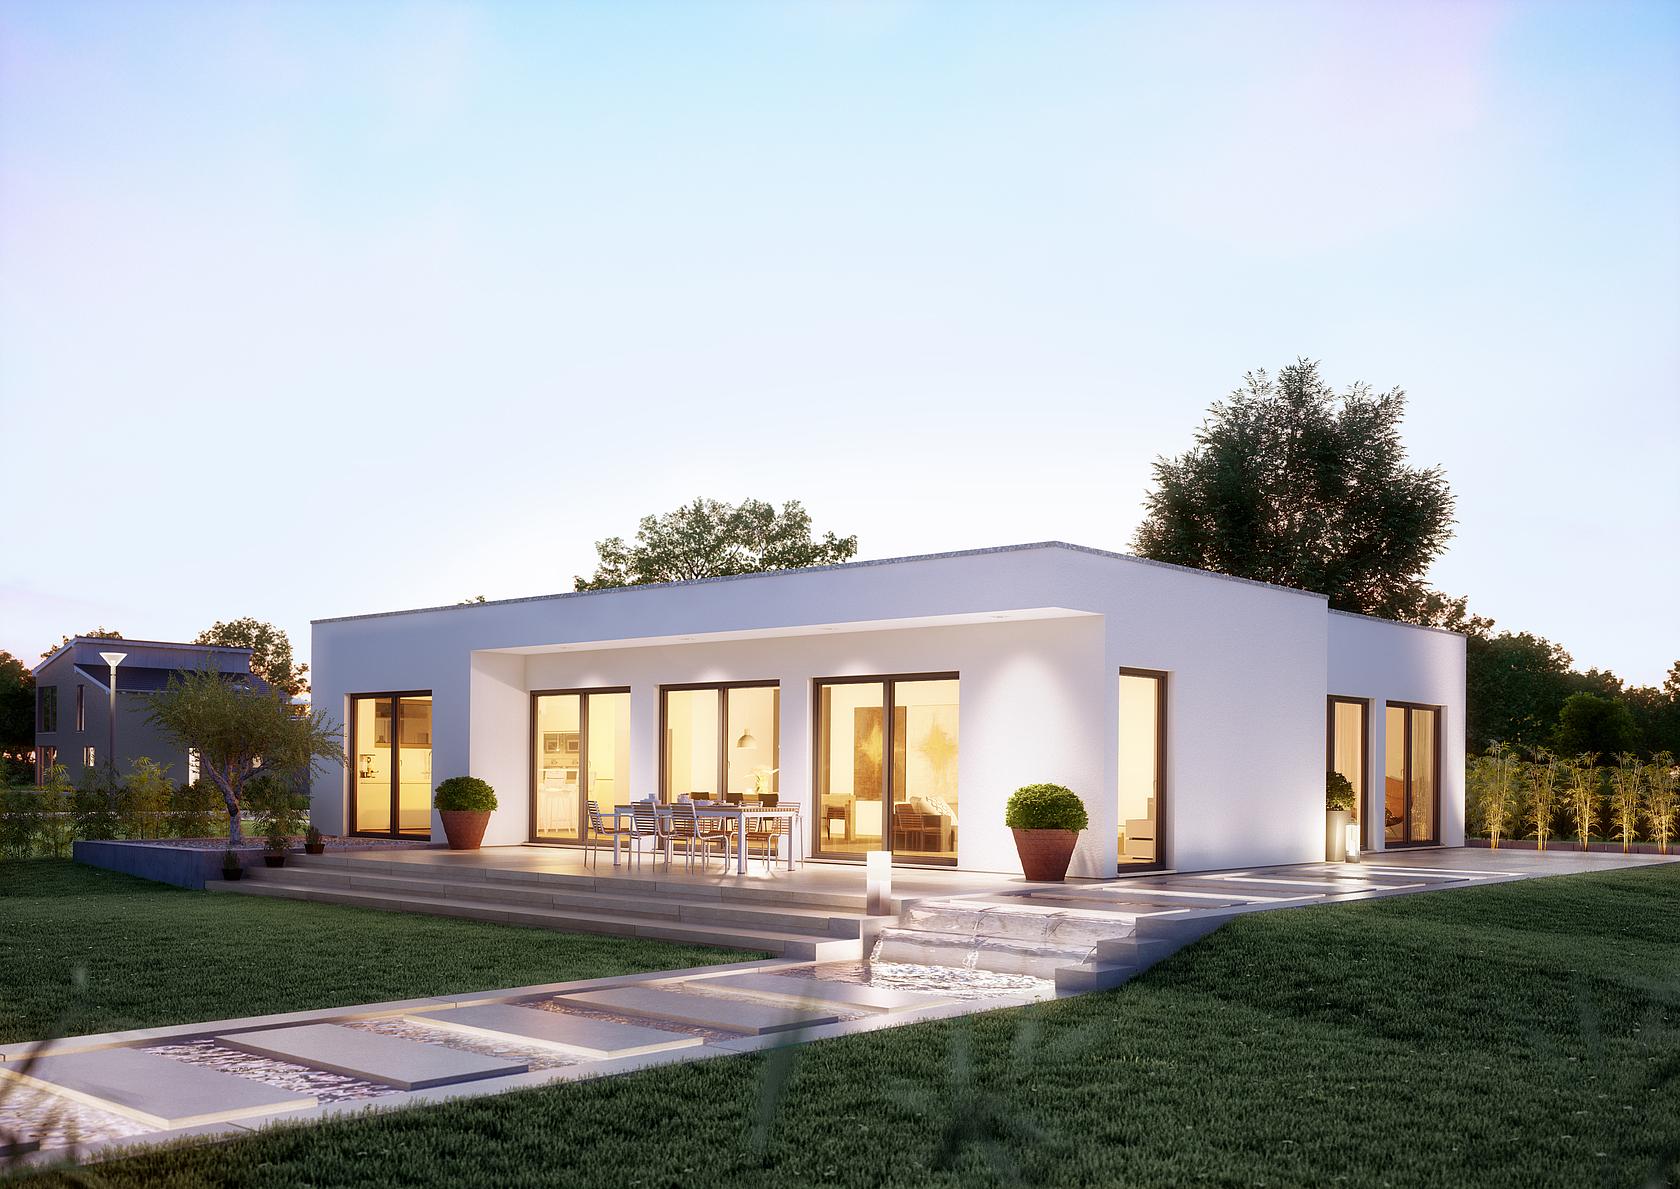 bungalow purea im bauhausstil kern haus. Black Bedroom Furniture Sets. Home Design Ideas